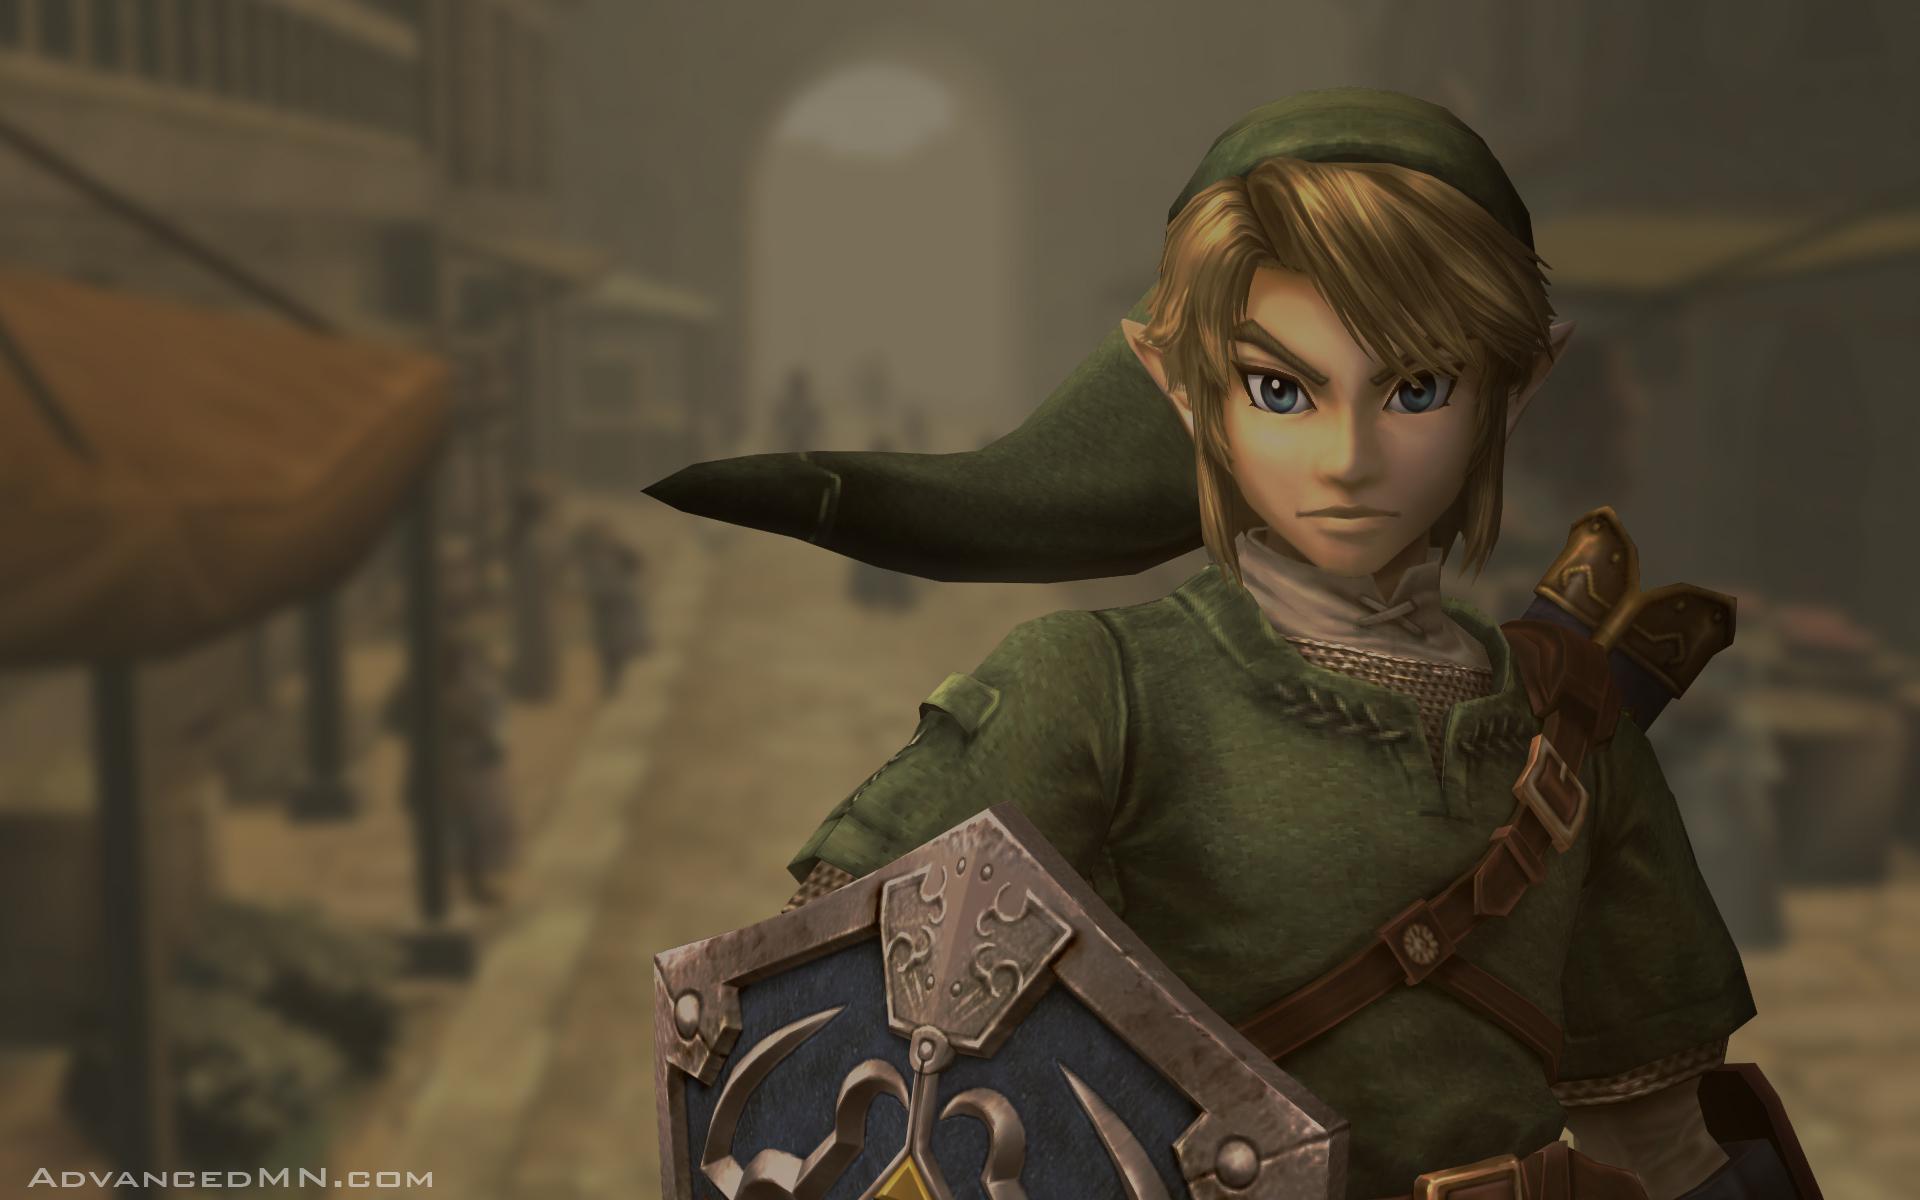 Link The Legend Of Zelda Twilight Princess Fresh New HD Wallpaper 1920x1200